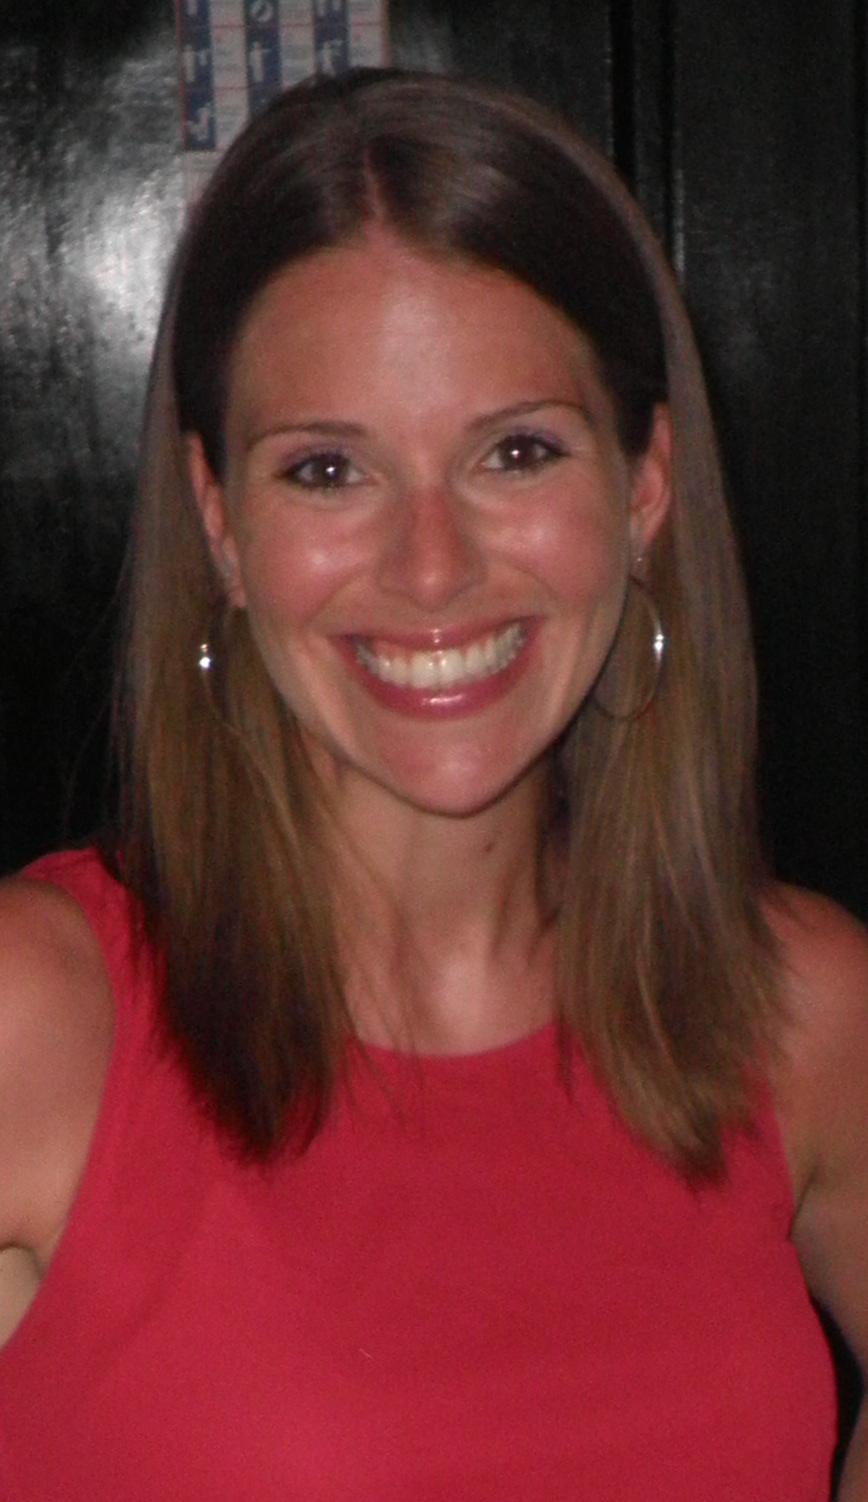 Samantha Gustantino